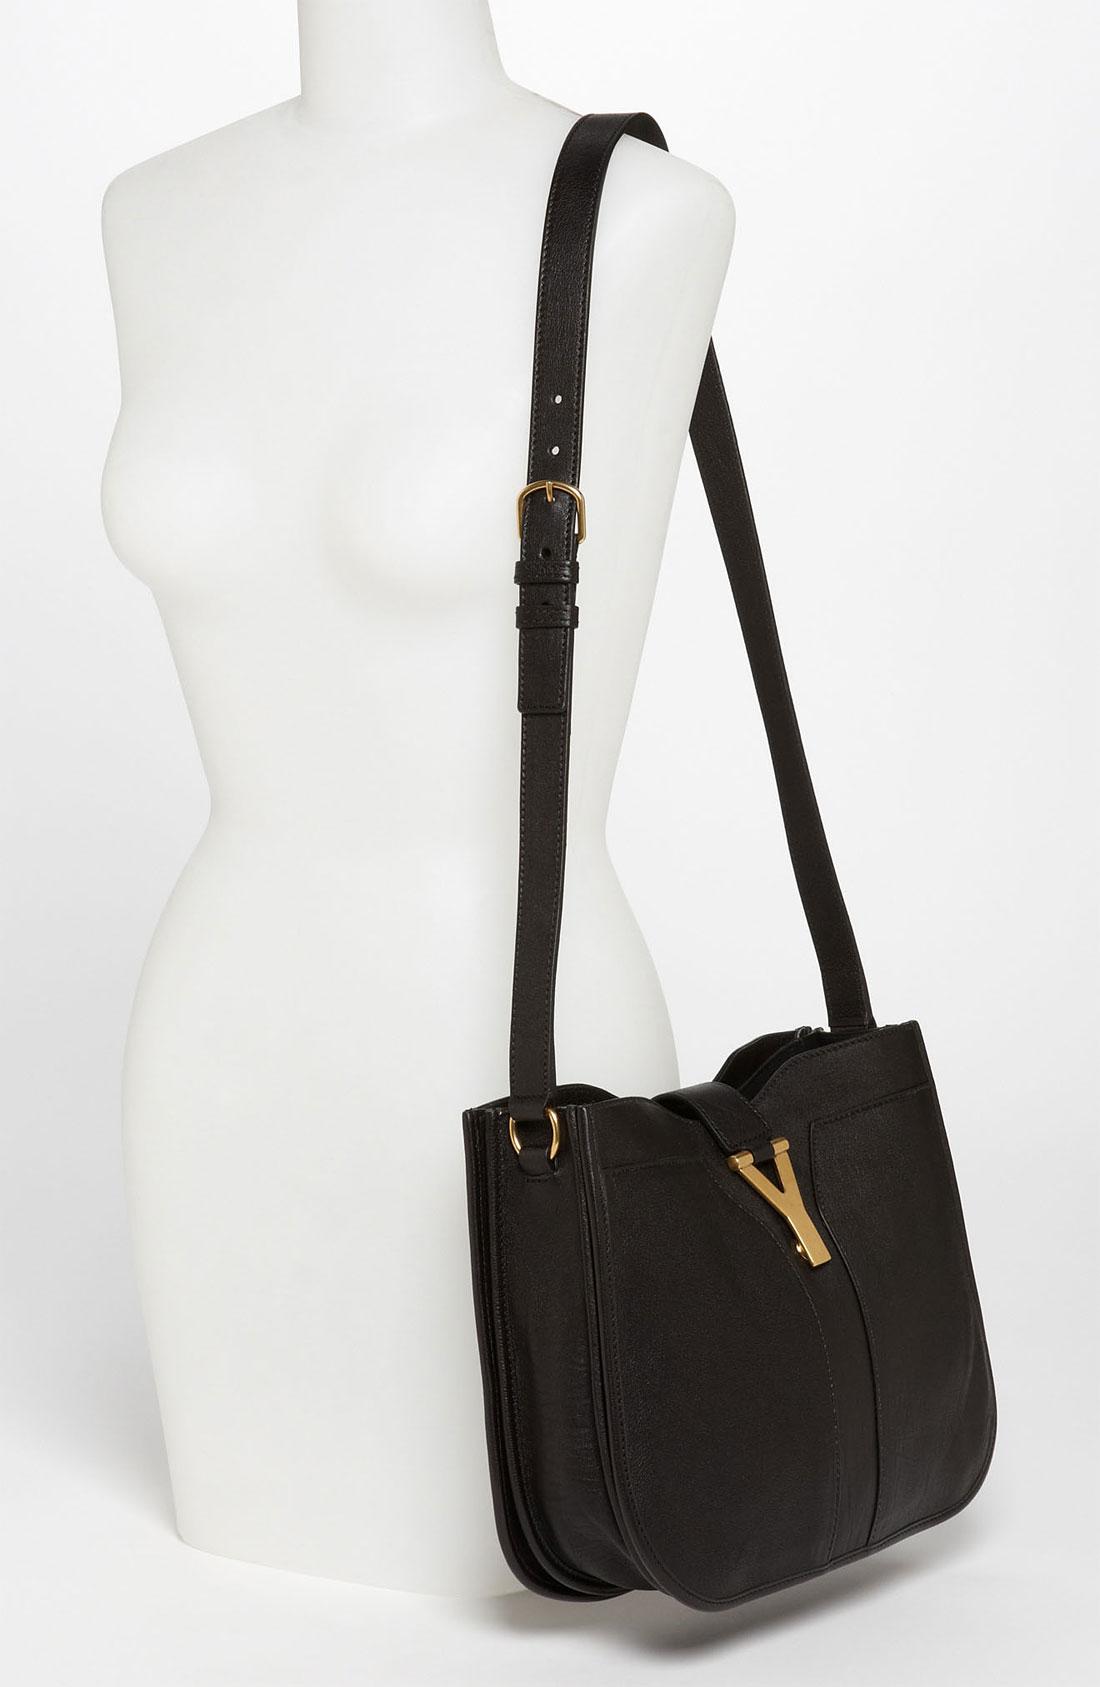 Saint laurent Cabas Chyc Medium Shoulder Bag in Black (nero)   Lyst